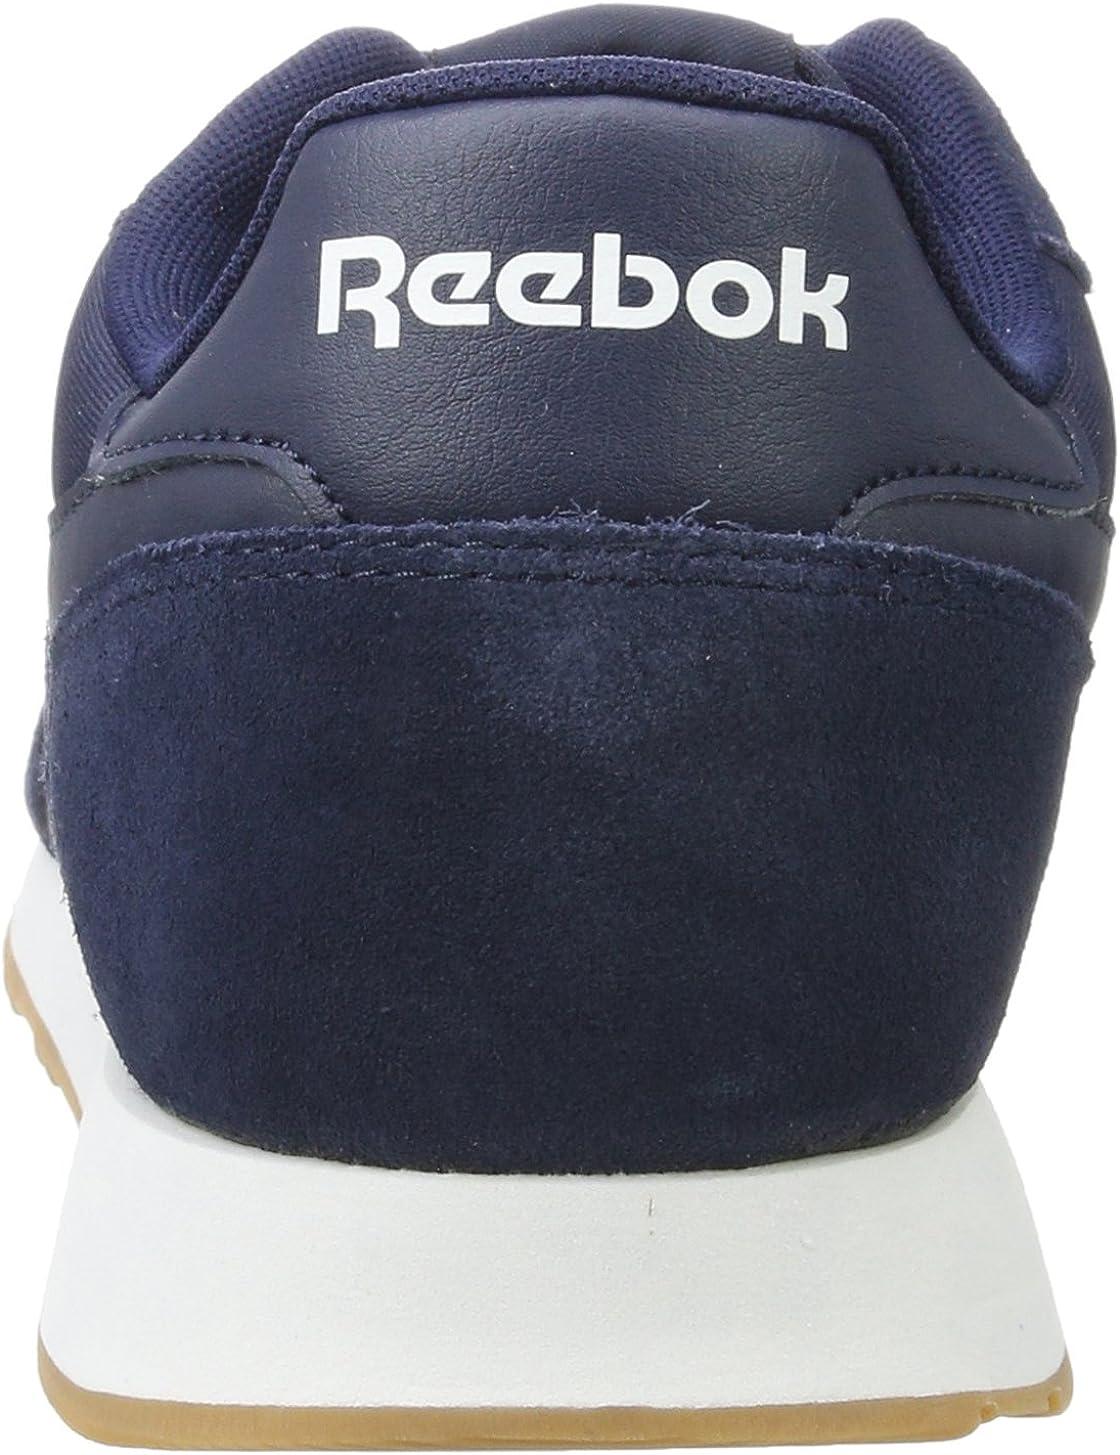 Baskets Basses Homme Reebok Royal Ultra